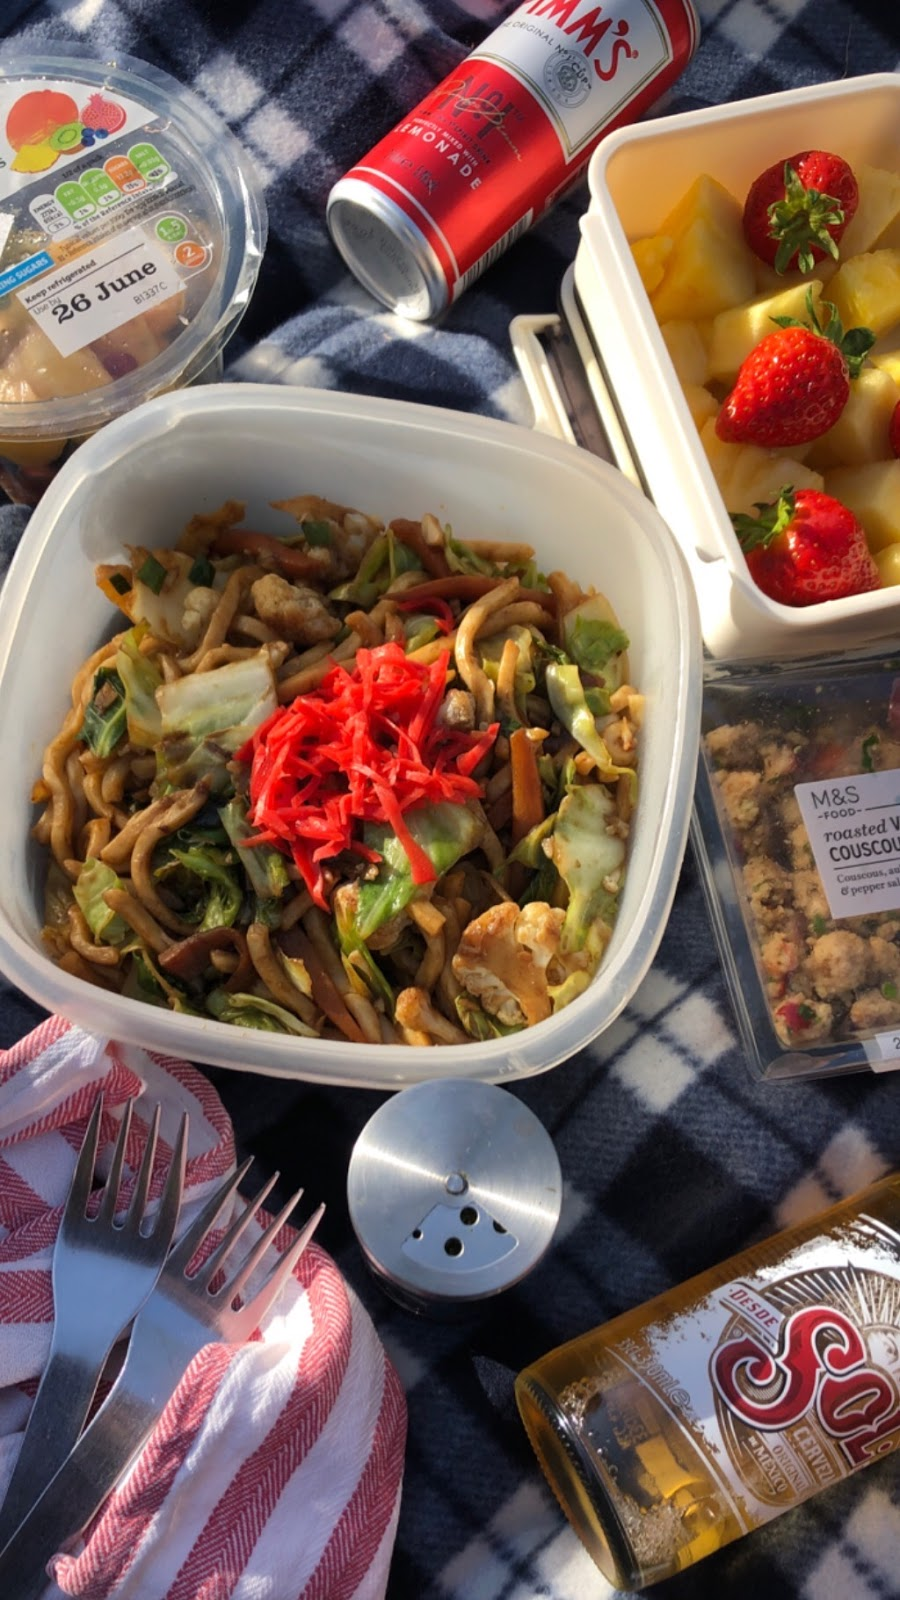 picnic, food blogger, lifestyle, flatlay, sol, london